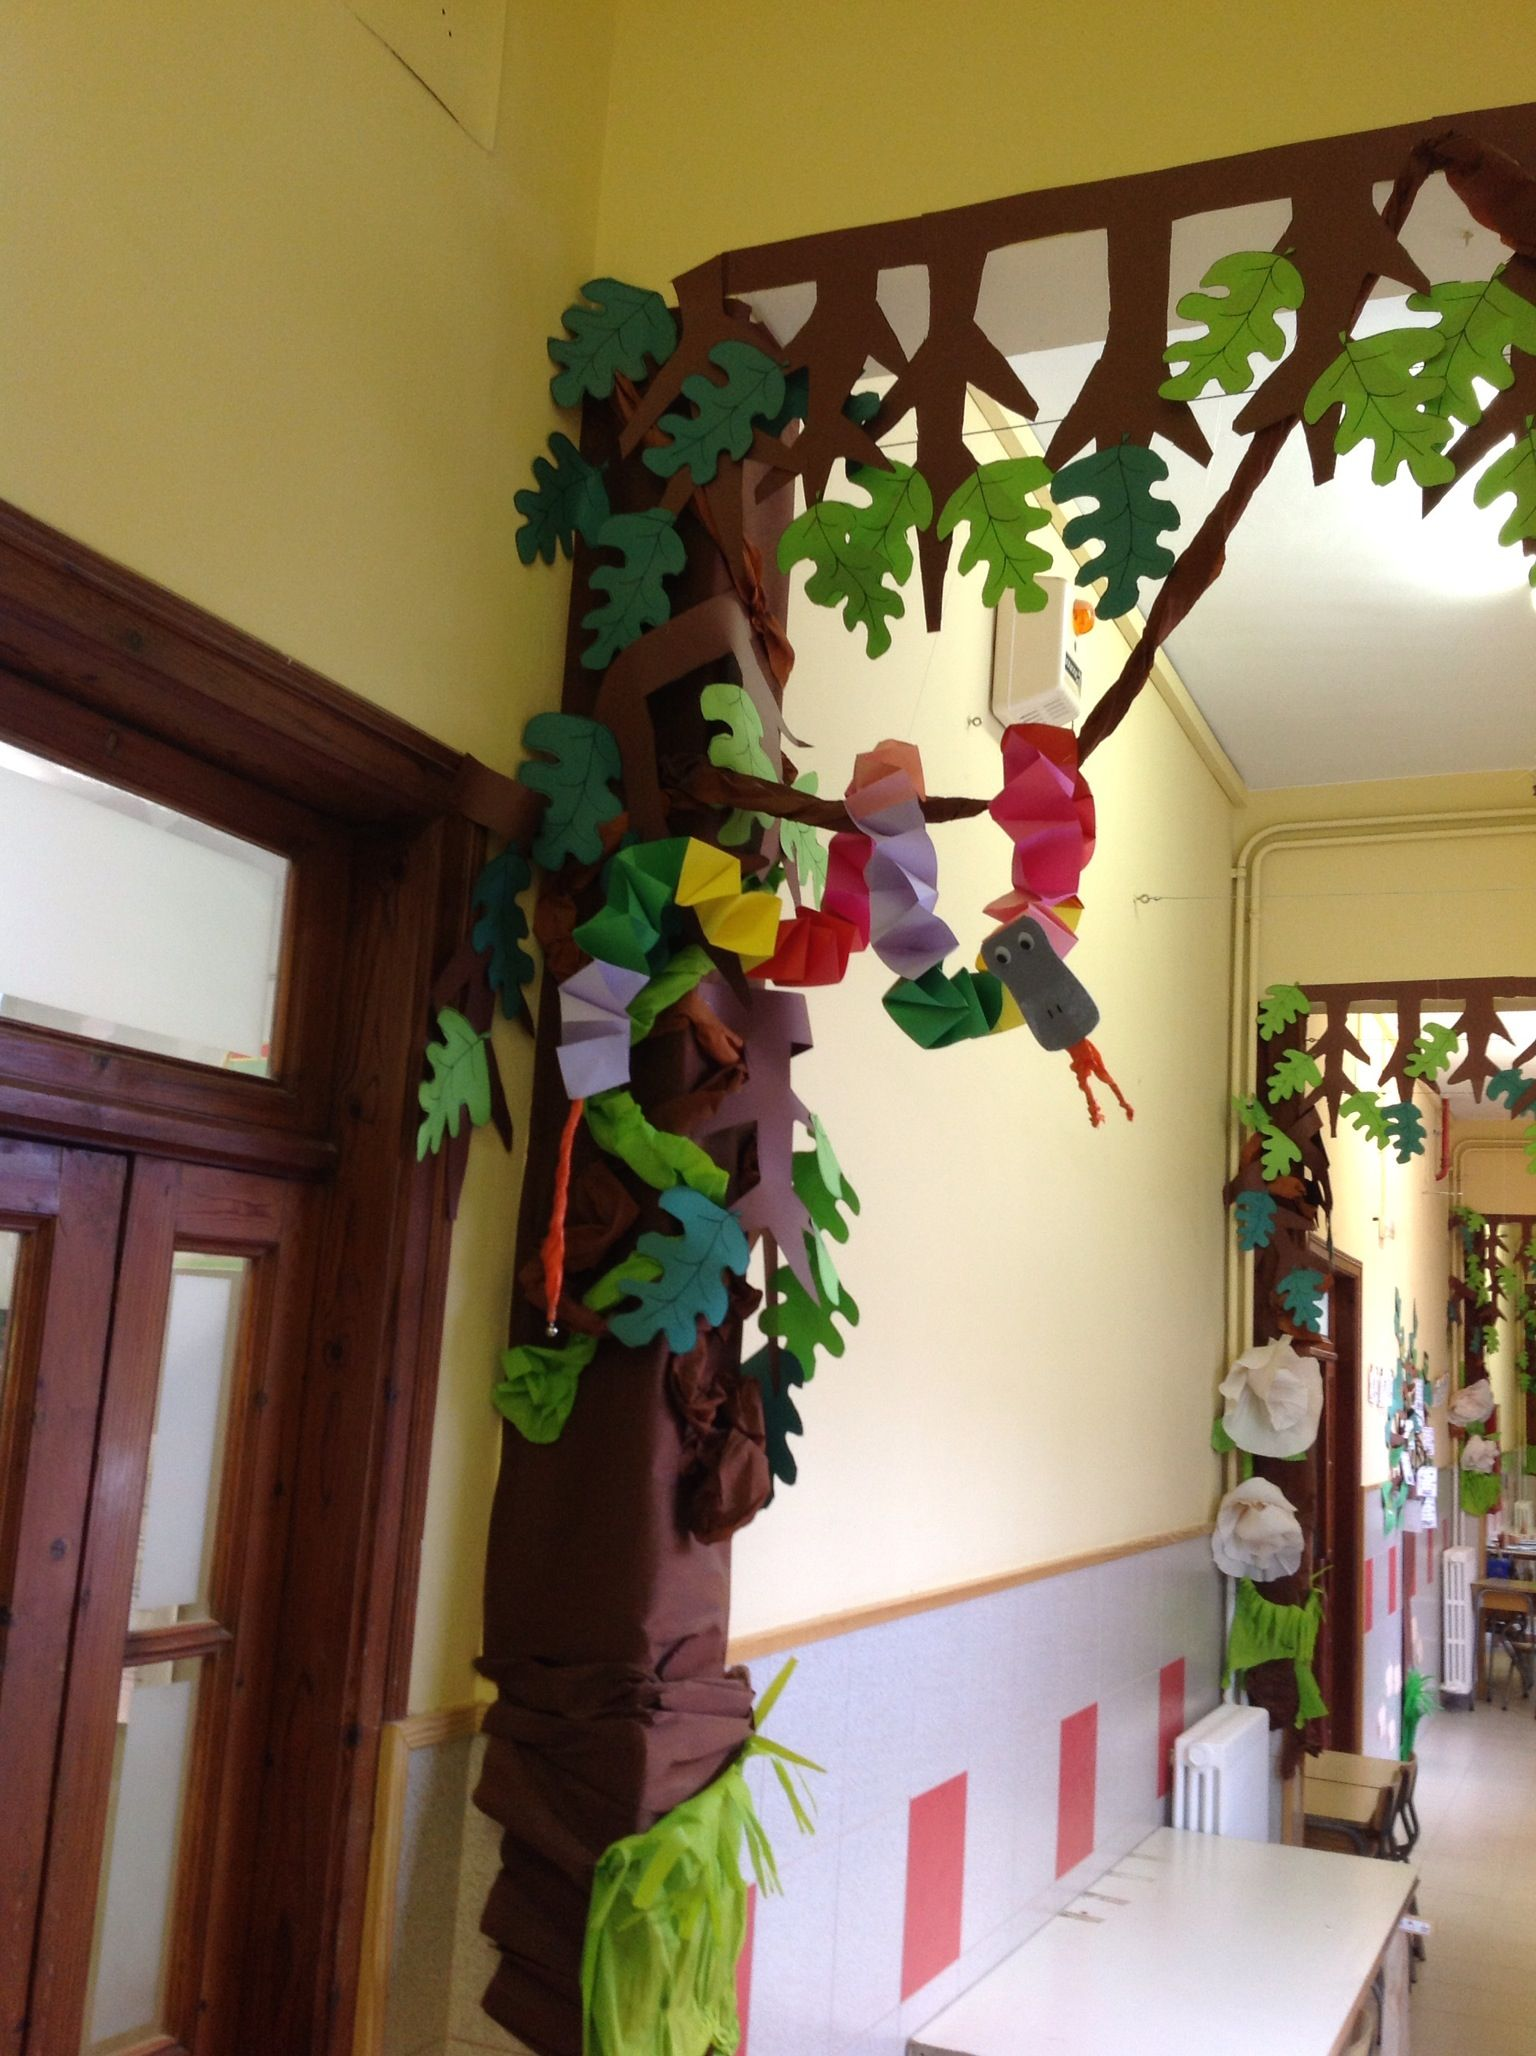 Una serp de cascabell pel passad s puertas decoracion for Decoracion de puertas infantiles